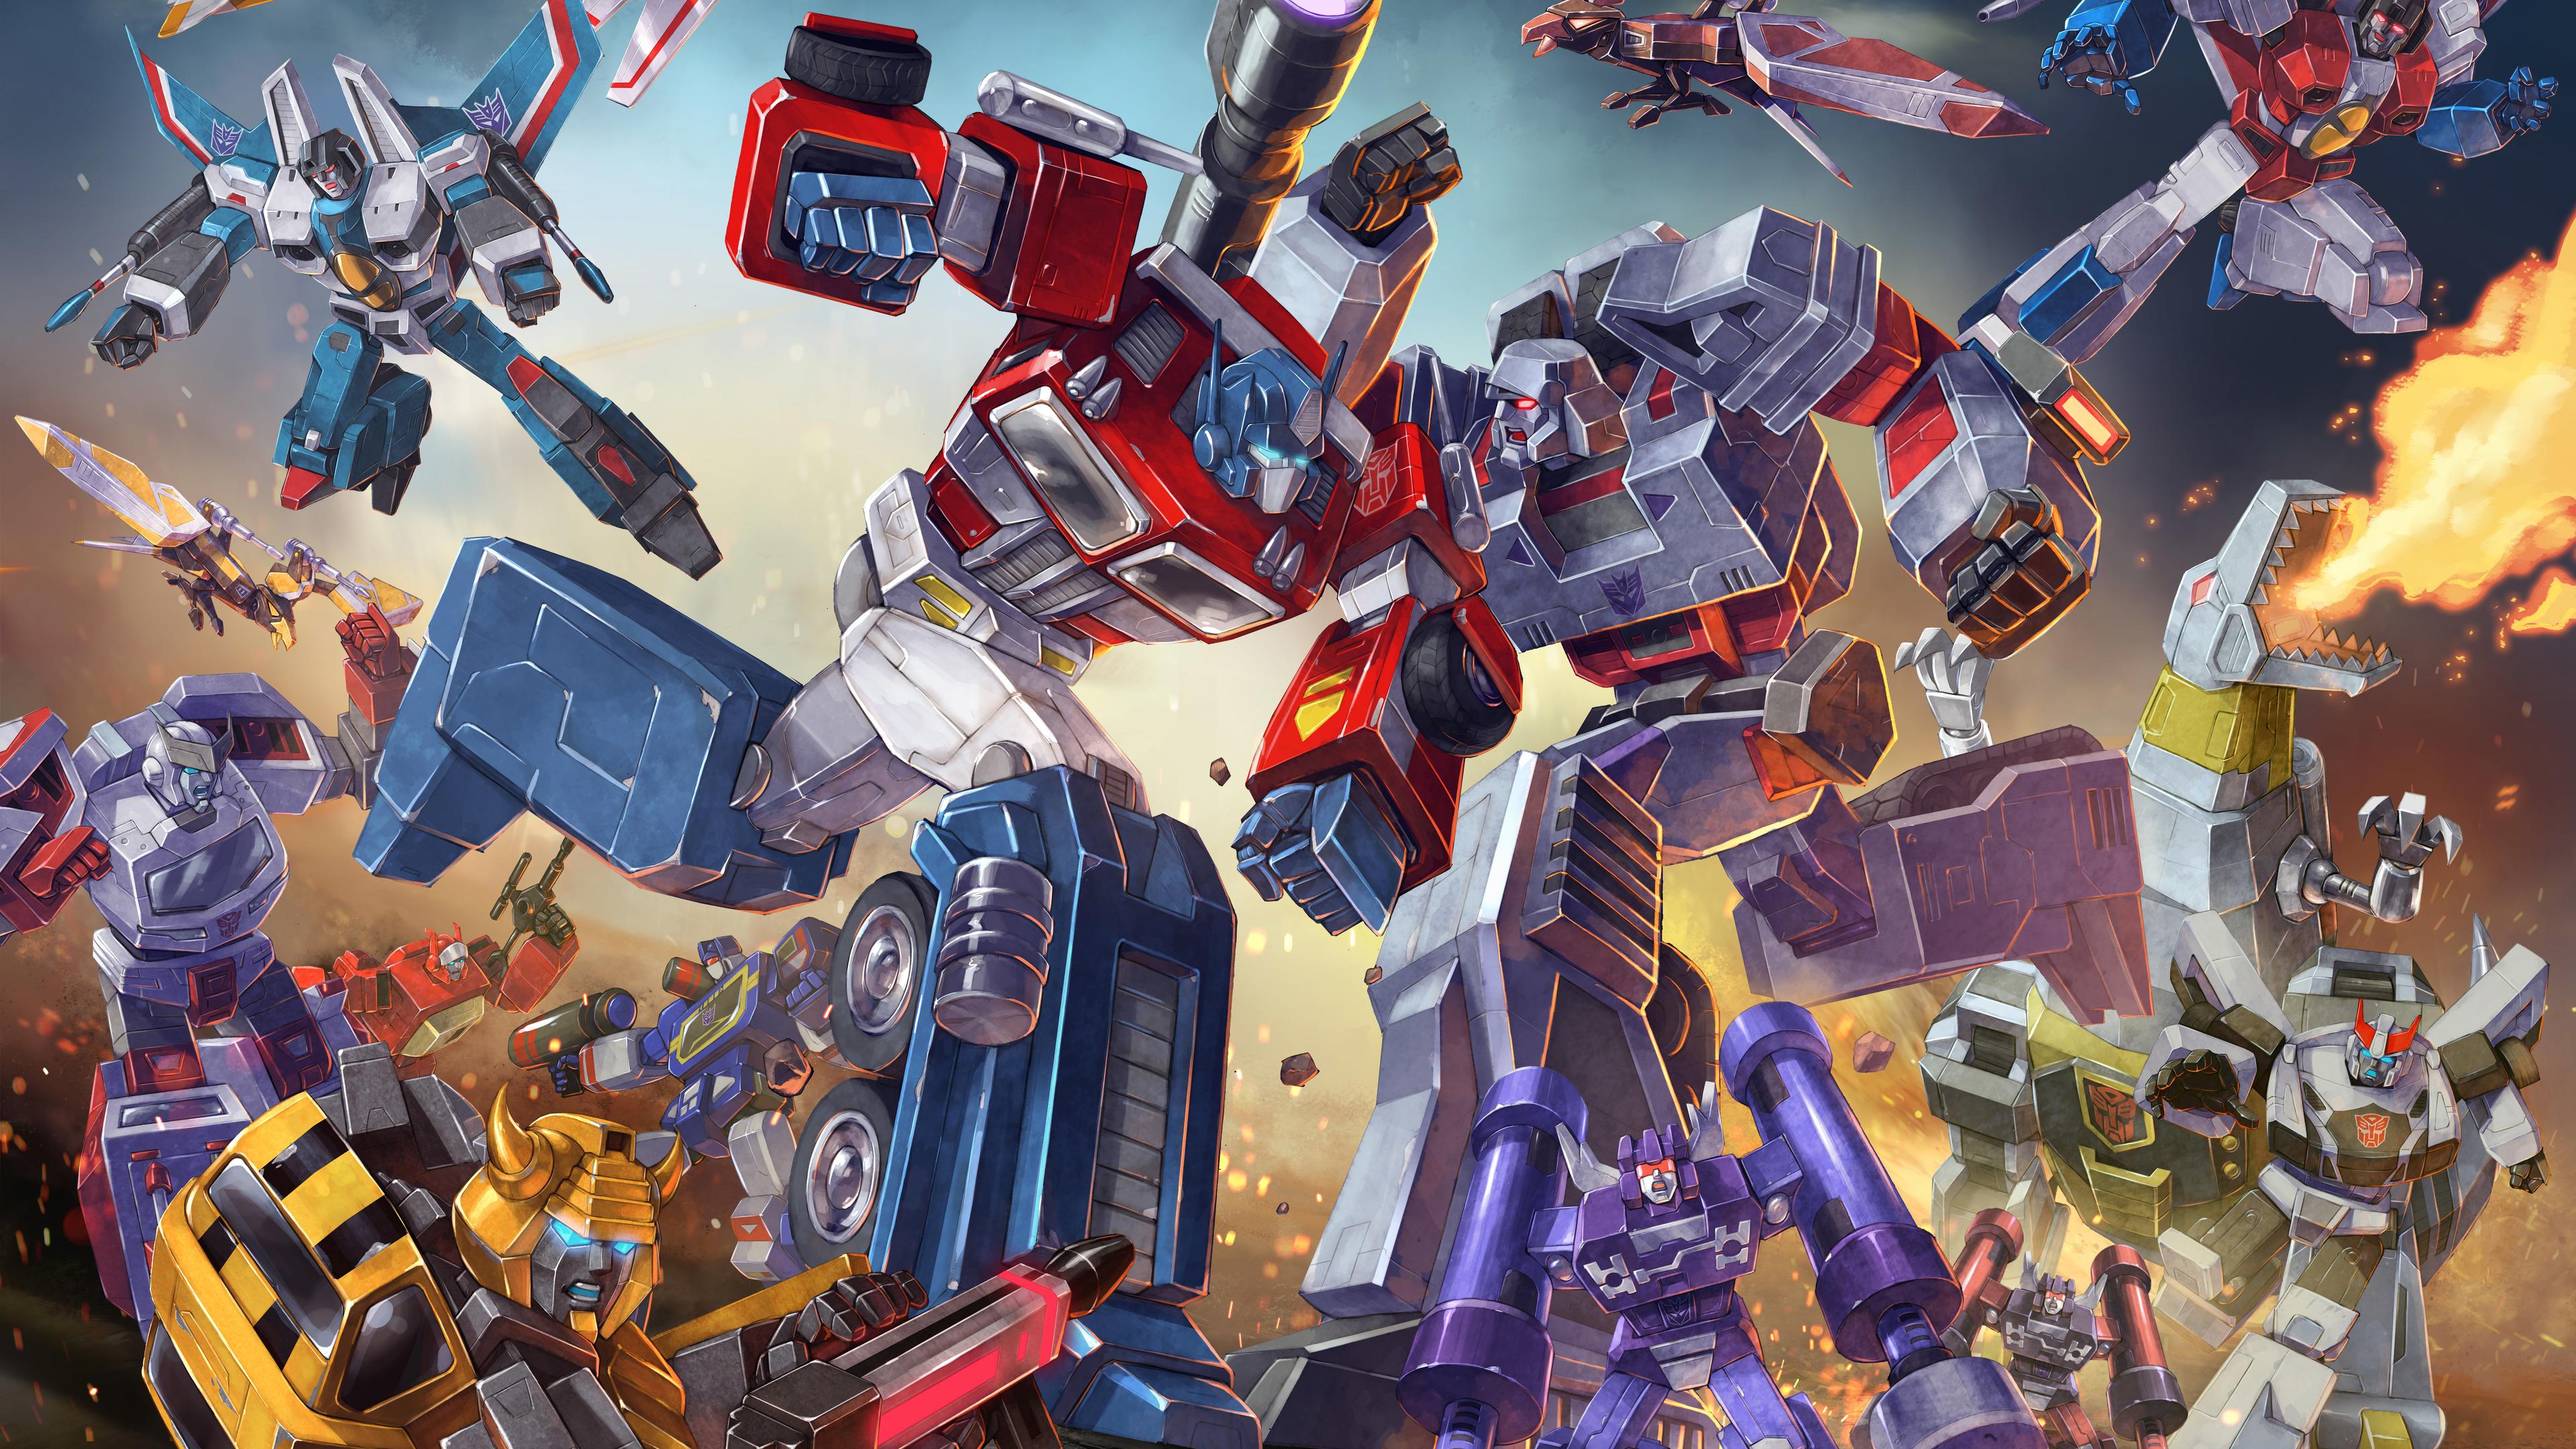 transformers earth wars 1539452808 - Transformers Earth Wars - transformers wallpapers, hd-wallpapers, 8k wallpapers, 5k wallpapers, 4k-wallpapers, 10k wallpapers